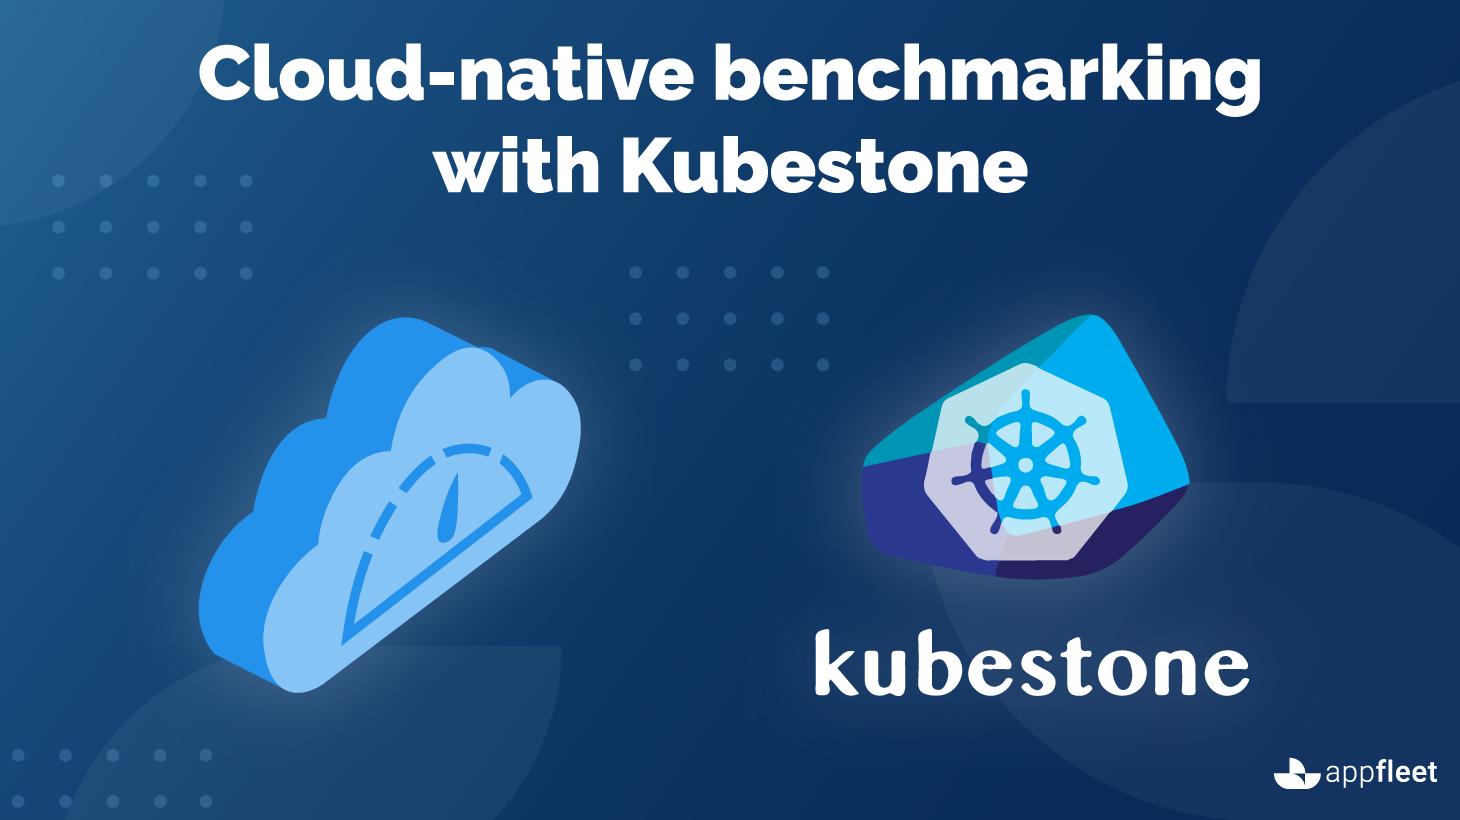 Cloud-native benchmarking with Kubestone